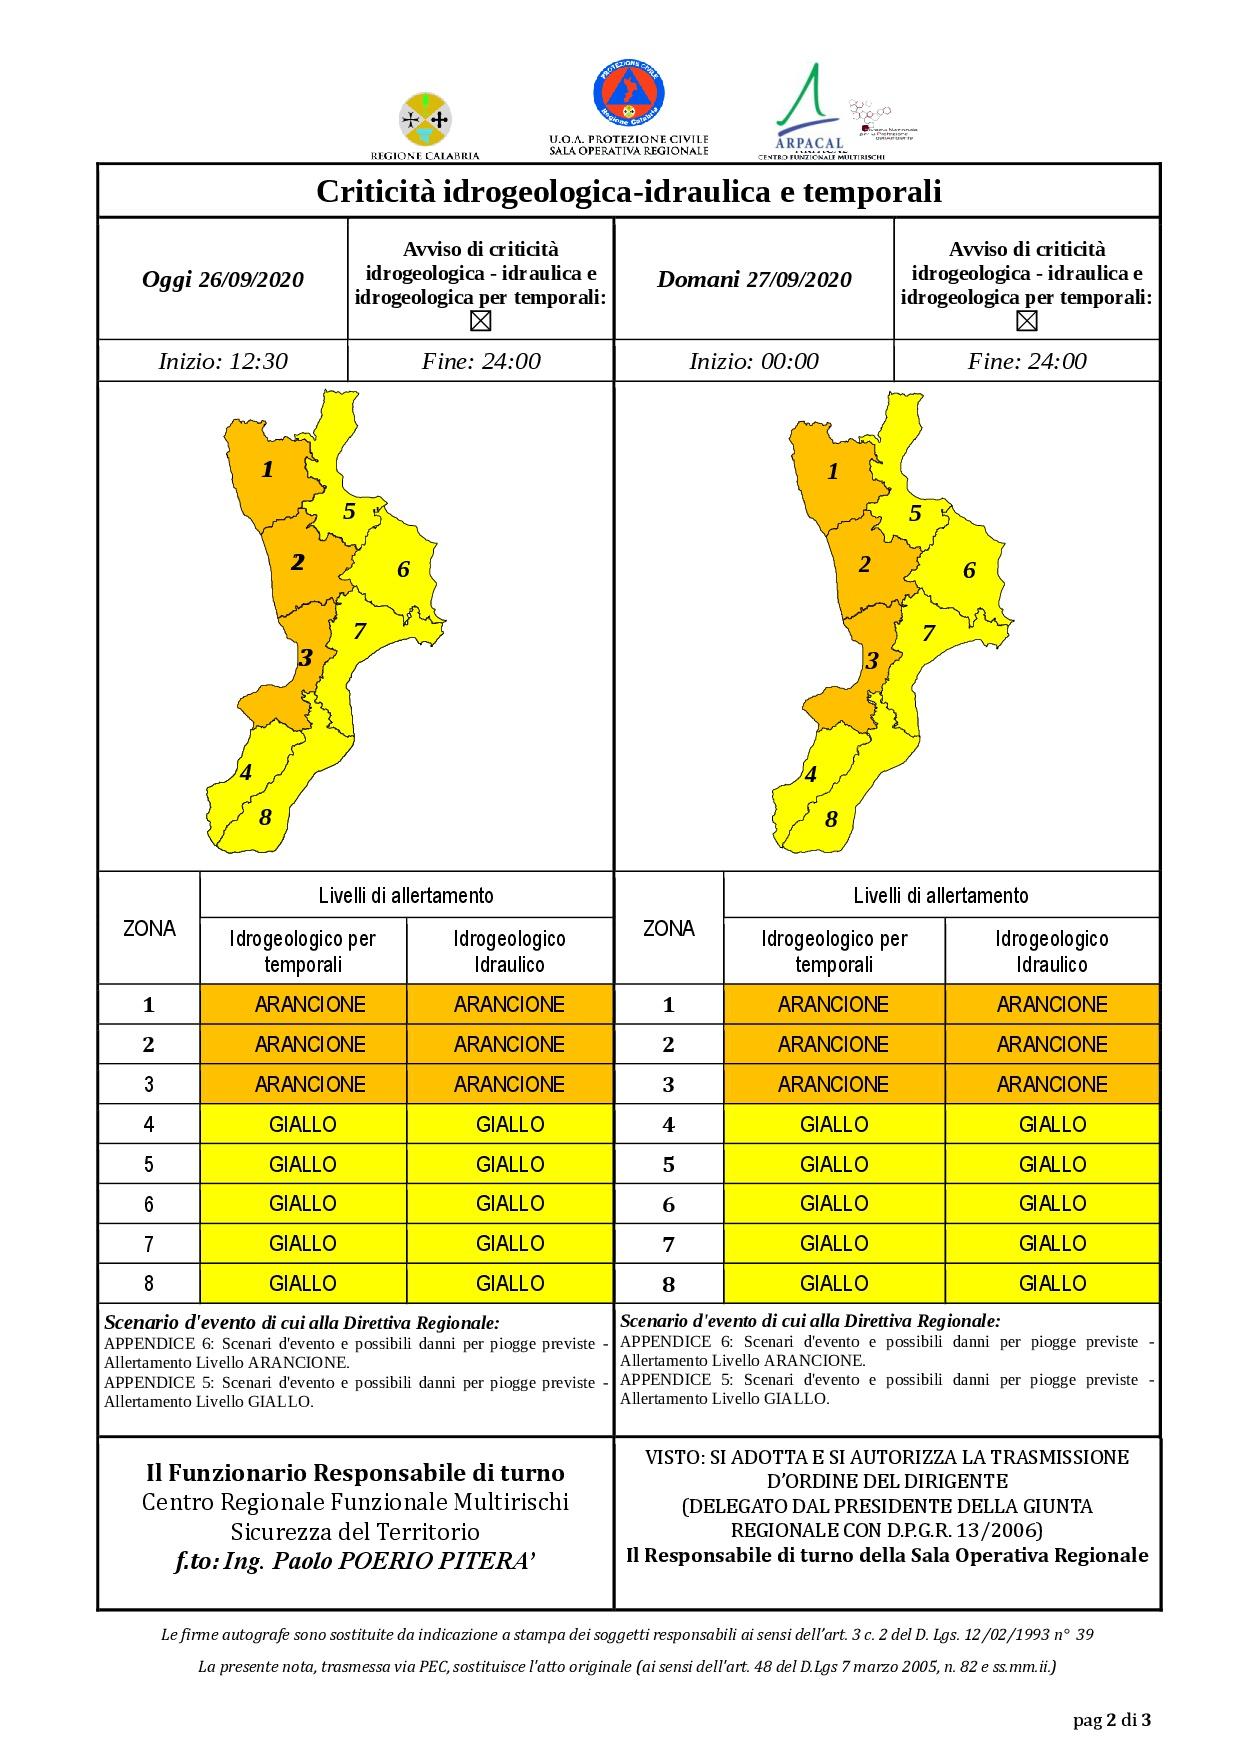 Criticità idrogeologica-idraulica e temporali in Calabria 26-09-2020